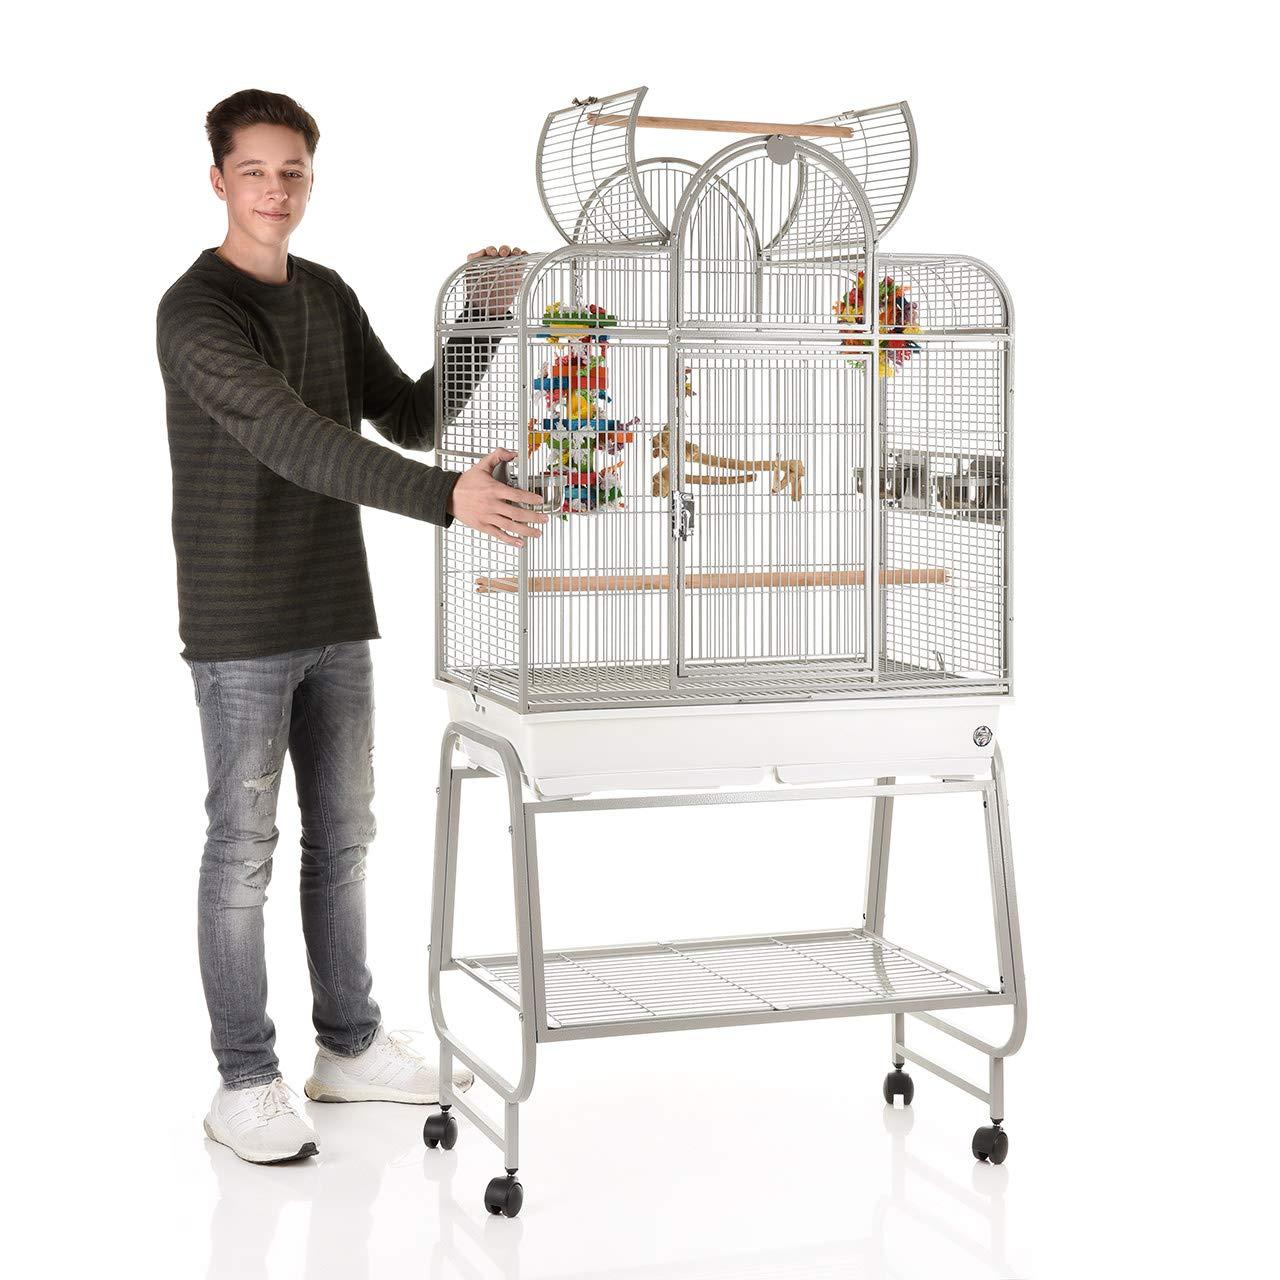 Montana San Remo III Metal Wire Cage with Avilon Powder Coating Bird Cage, 85 x 48 x 168 cm, Platinum